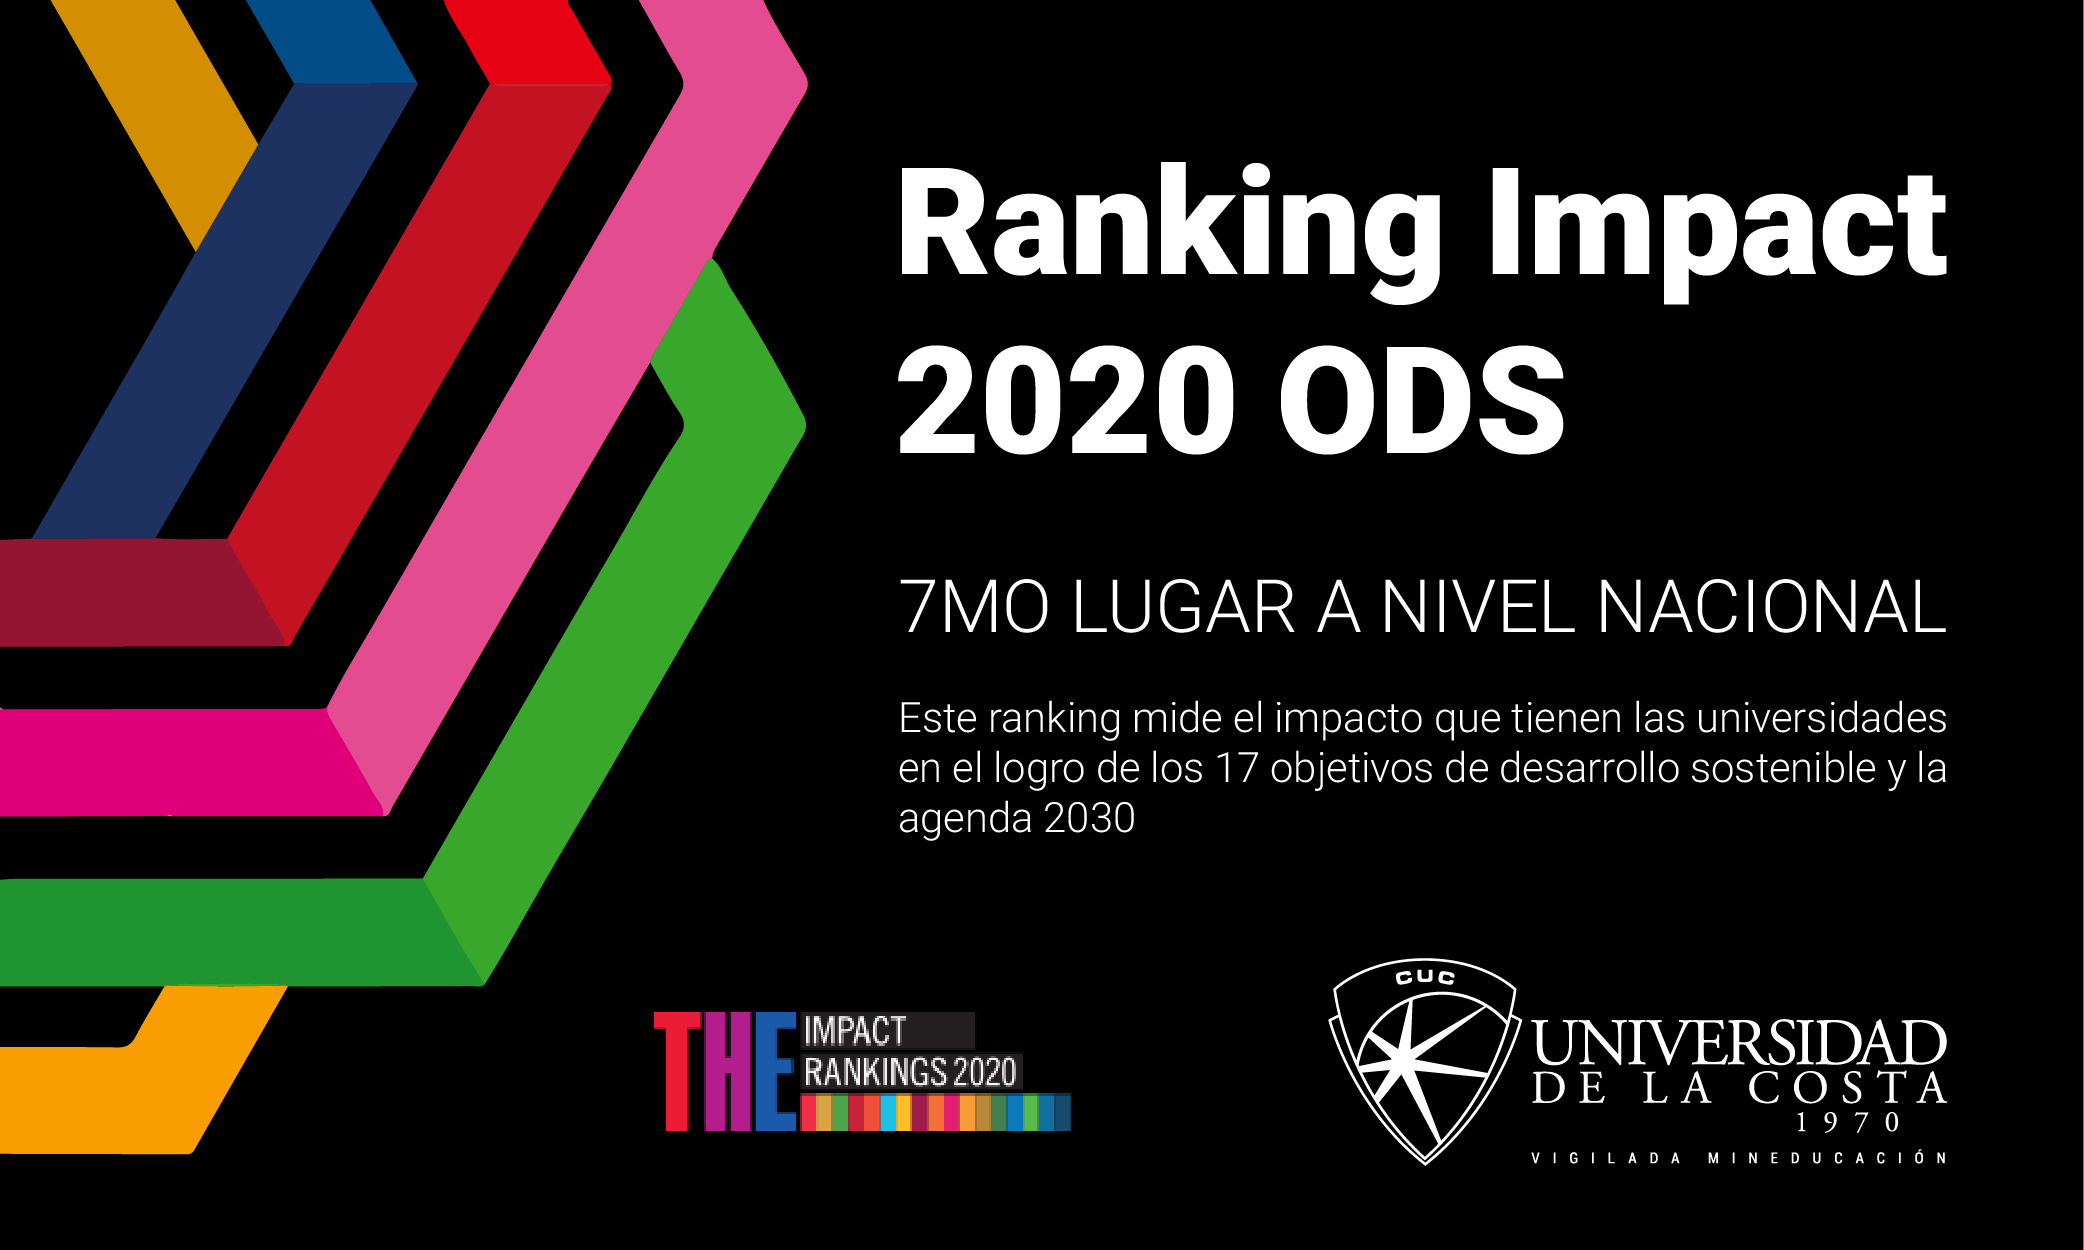 ranking impact 2020 ods universidad de la costa cuc